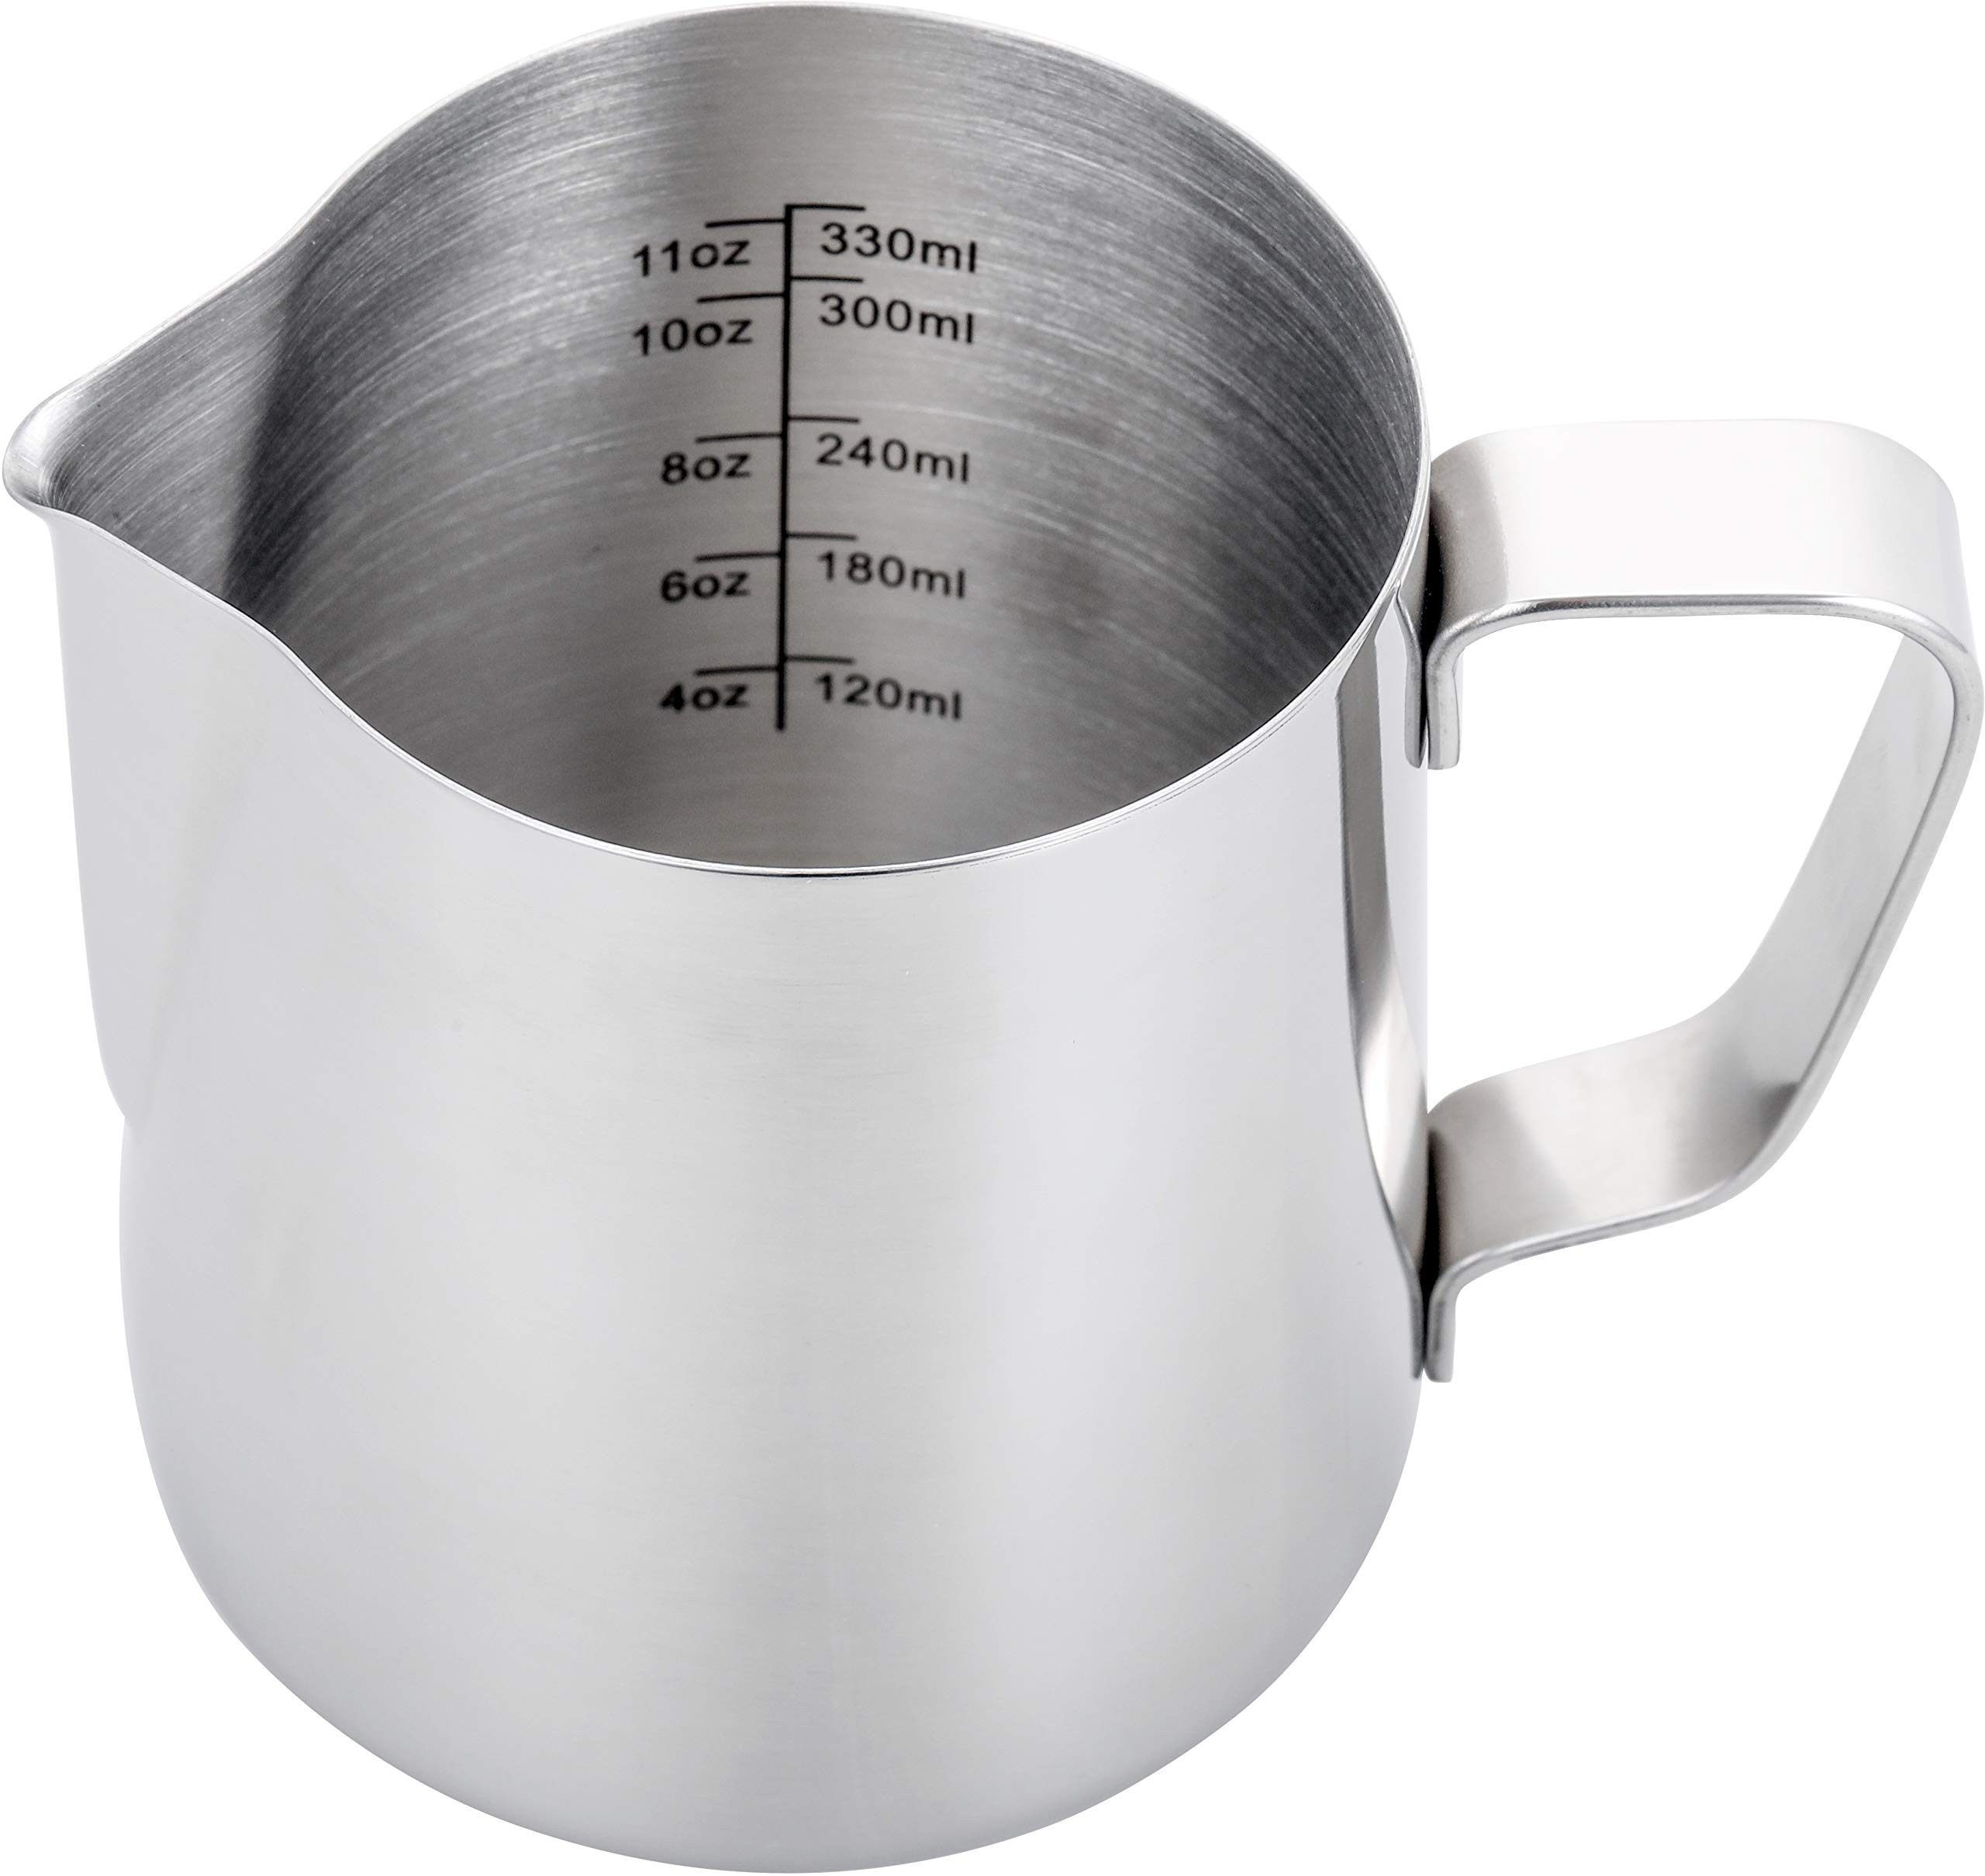 Espresso Steaming Pitcher 12 oz,Espresso Milk